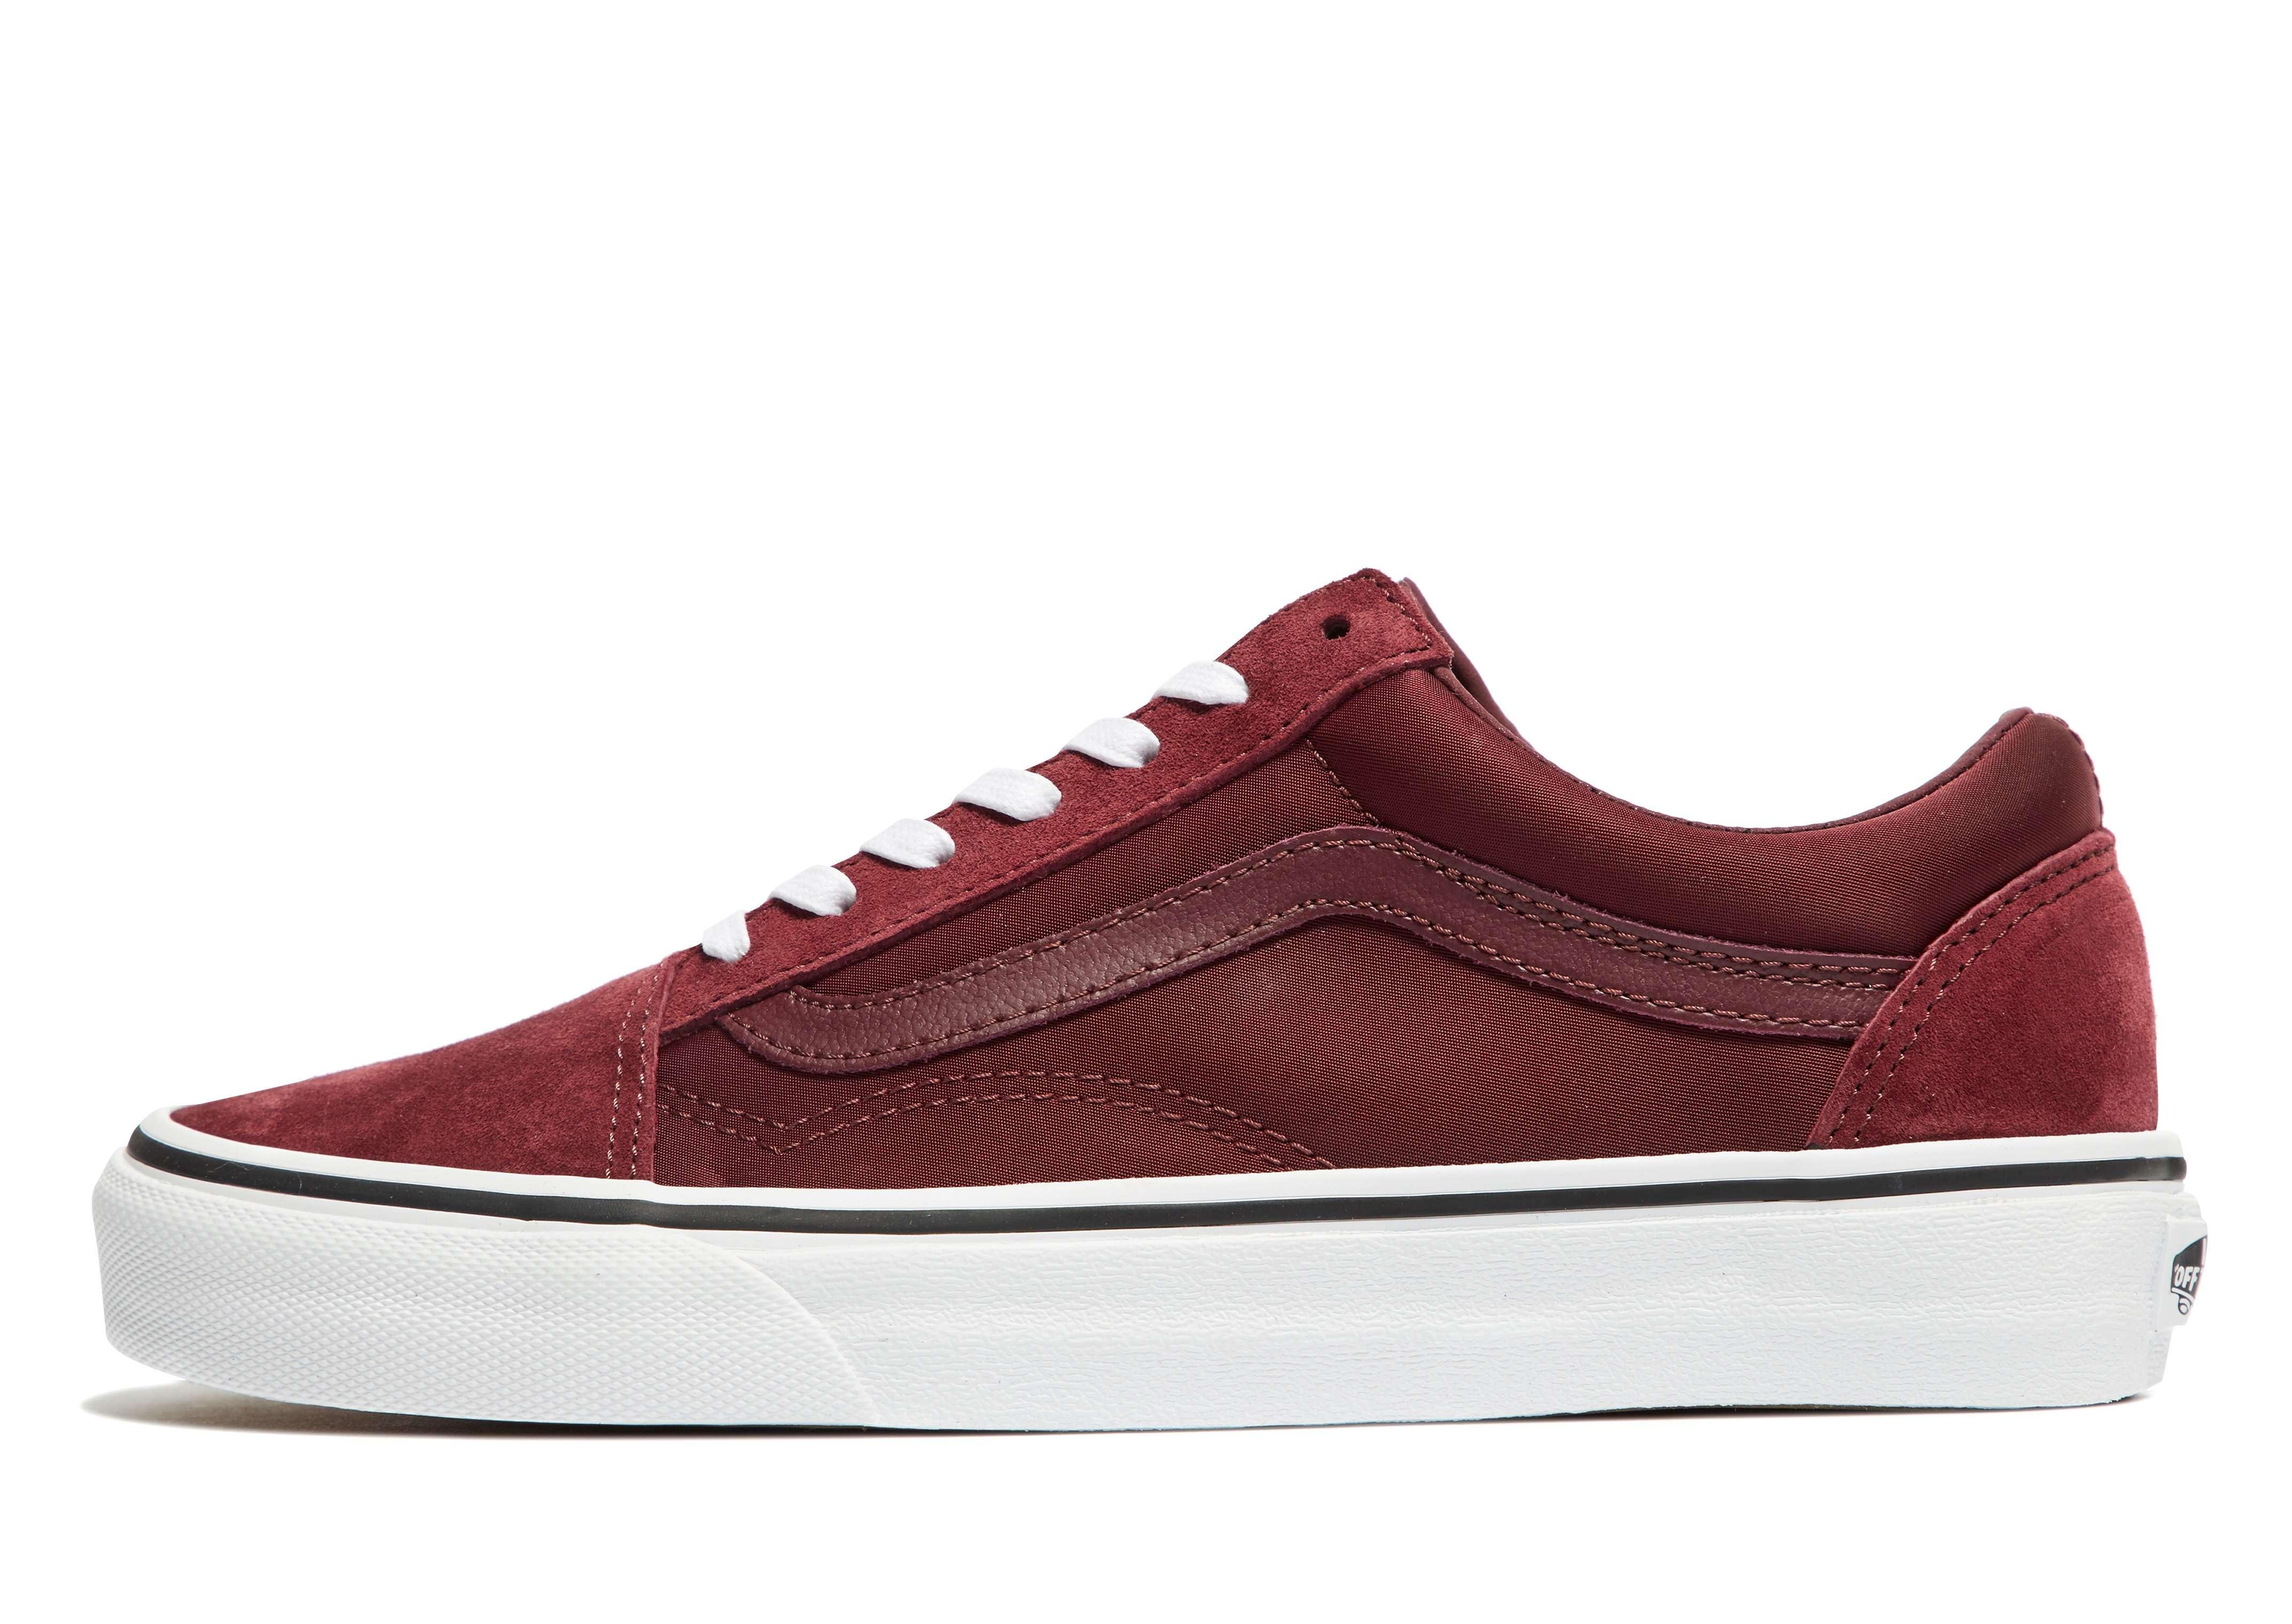 Vans Old Skool - Women's Trainers - Red 287817